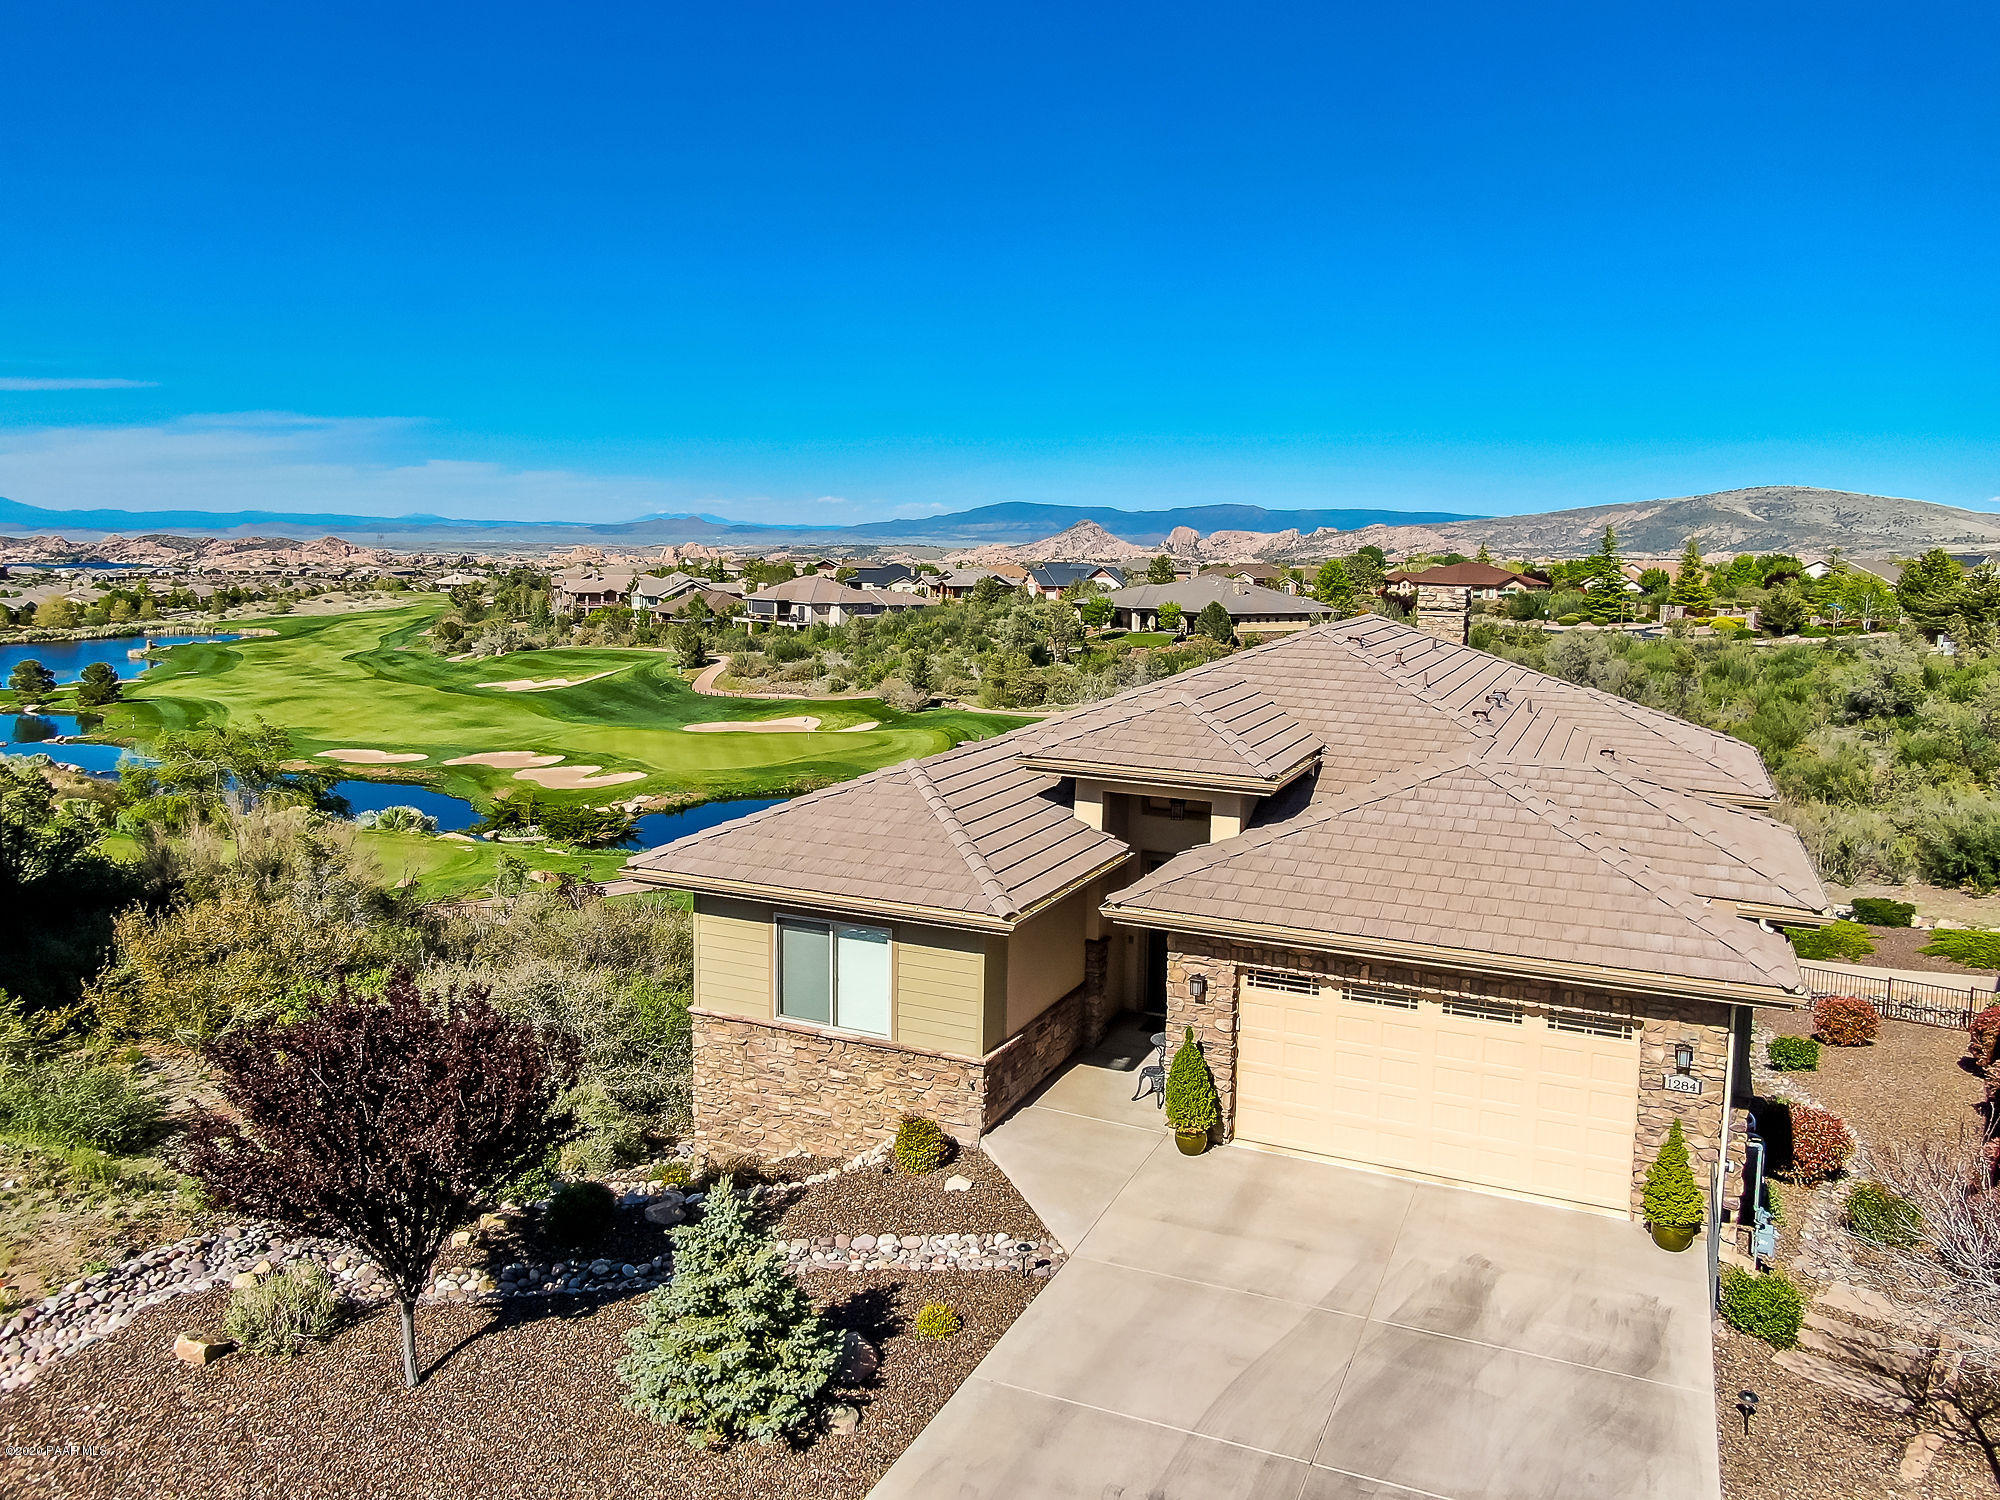 Photo of 1284 Pebble Springs, Prescott, AZ 86301